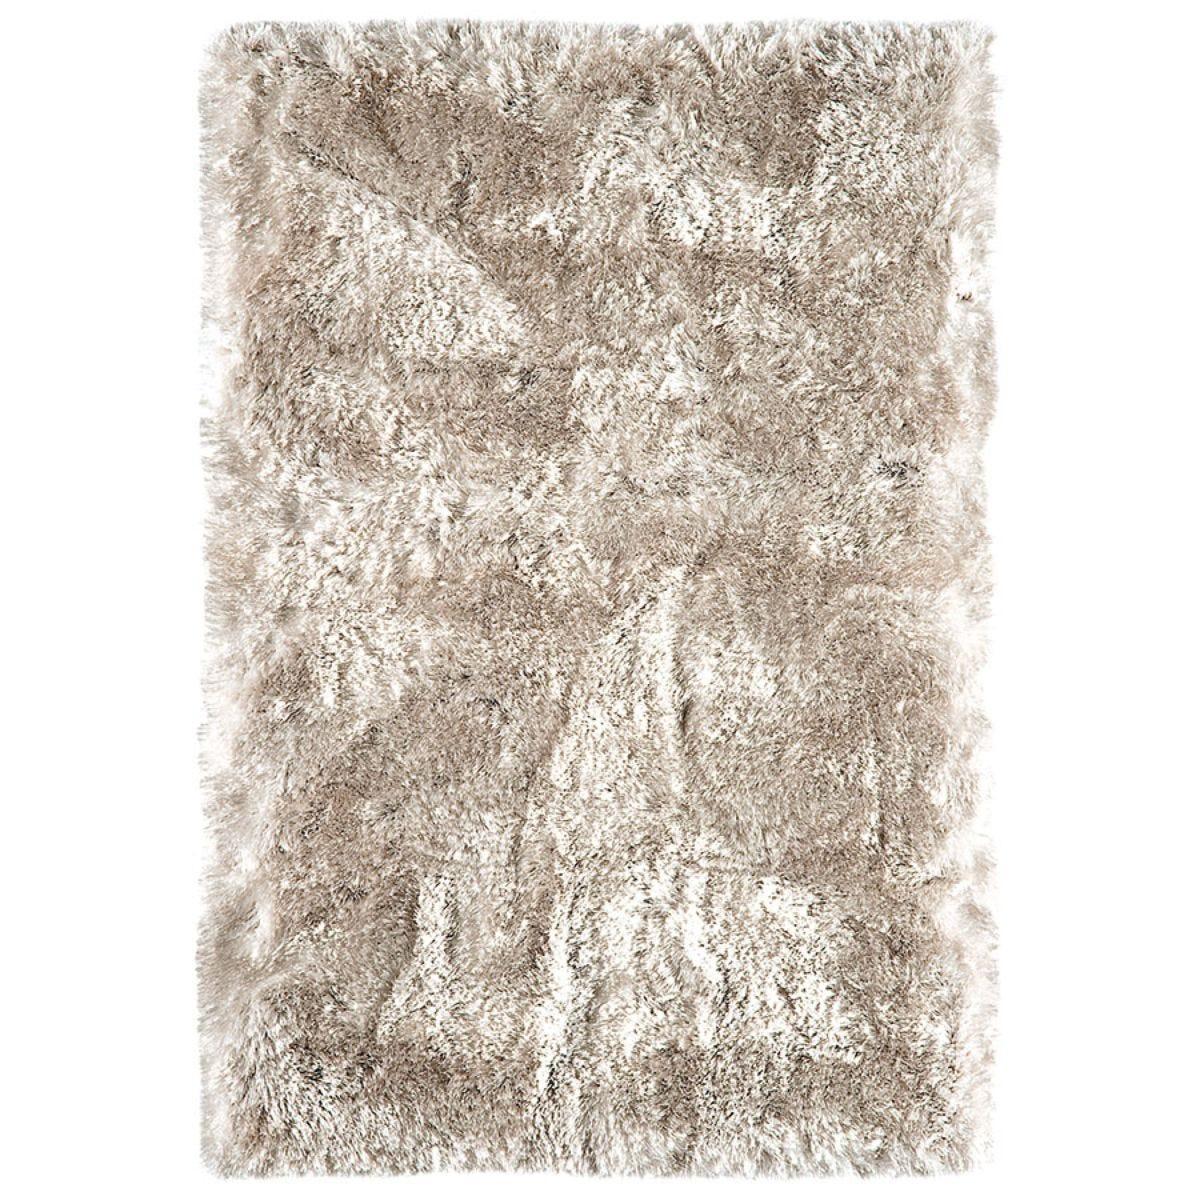 Asiatic Plush Shaggy Rug, 200 x 300cm - Sand